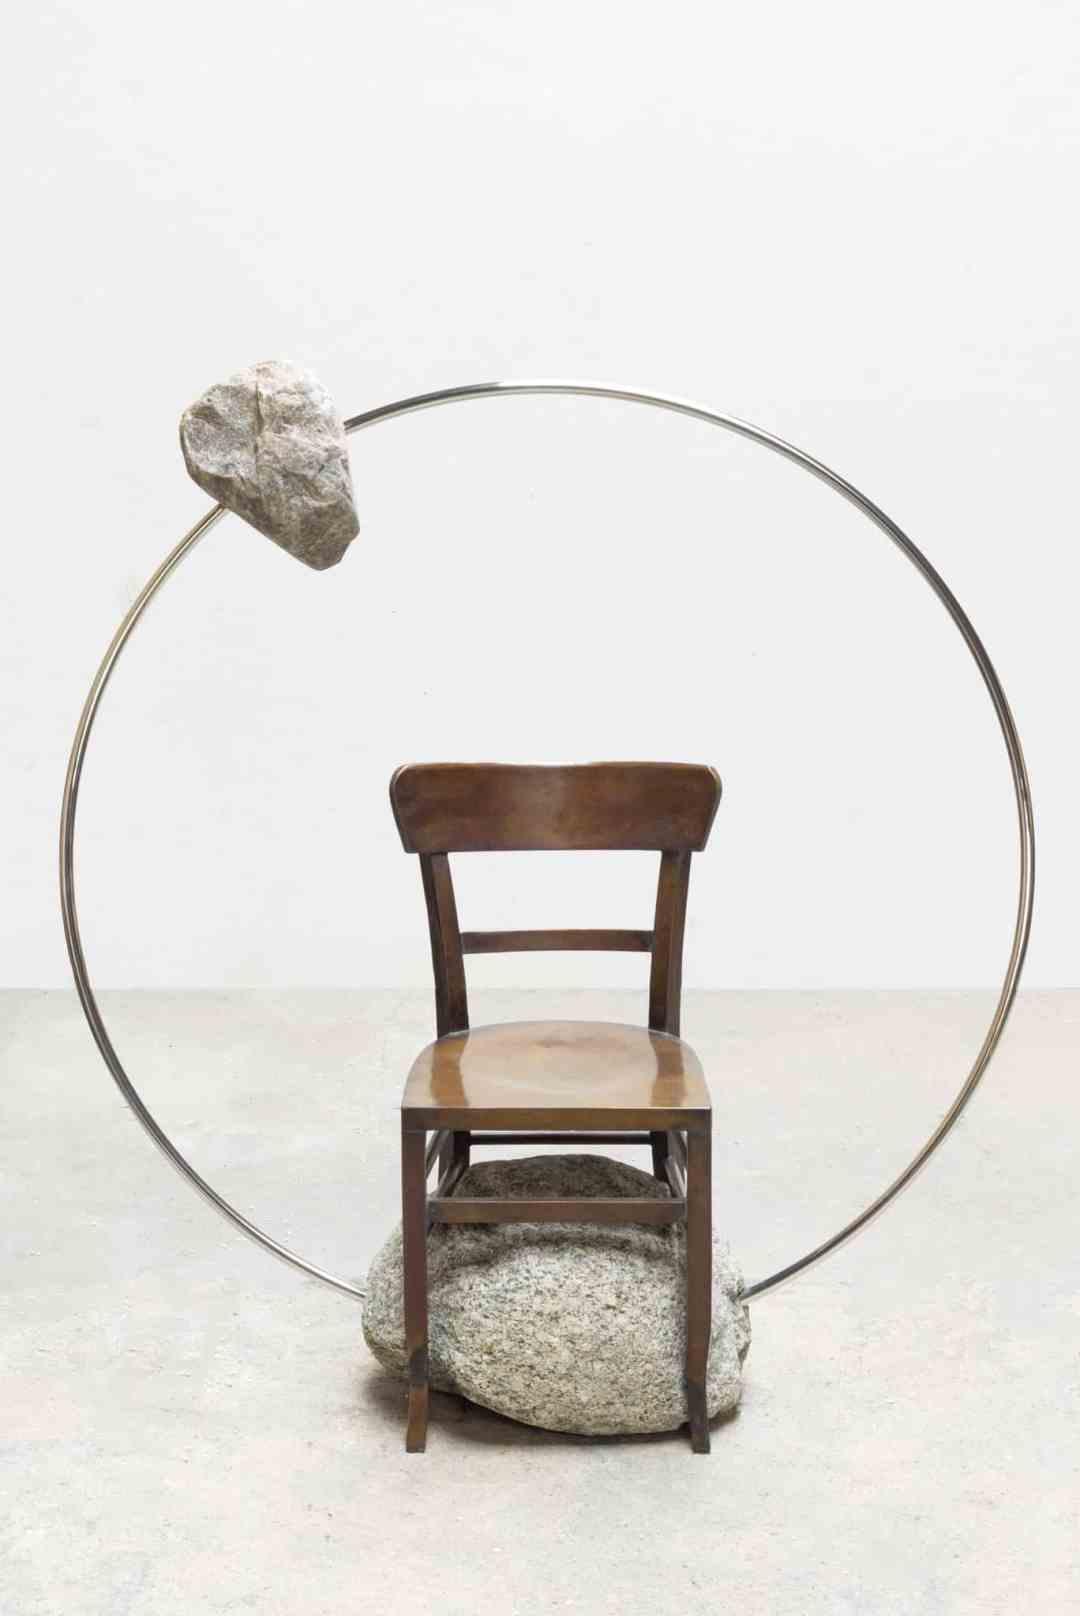 Alicja Kwade, Stuhl (Orbit), 2018, Kamel Mennour Gallery